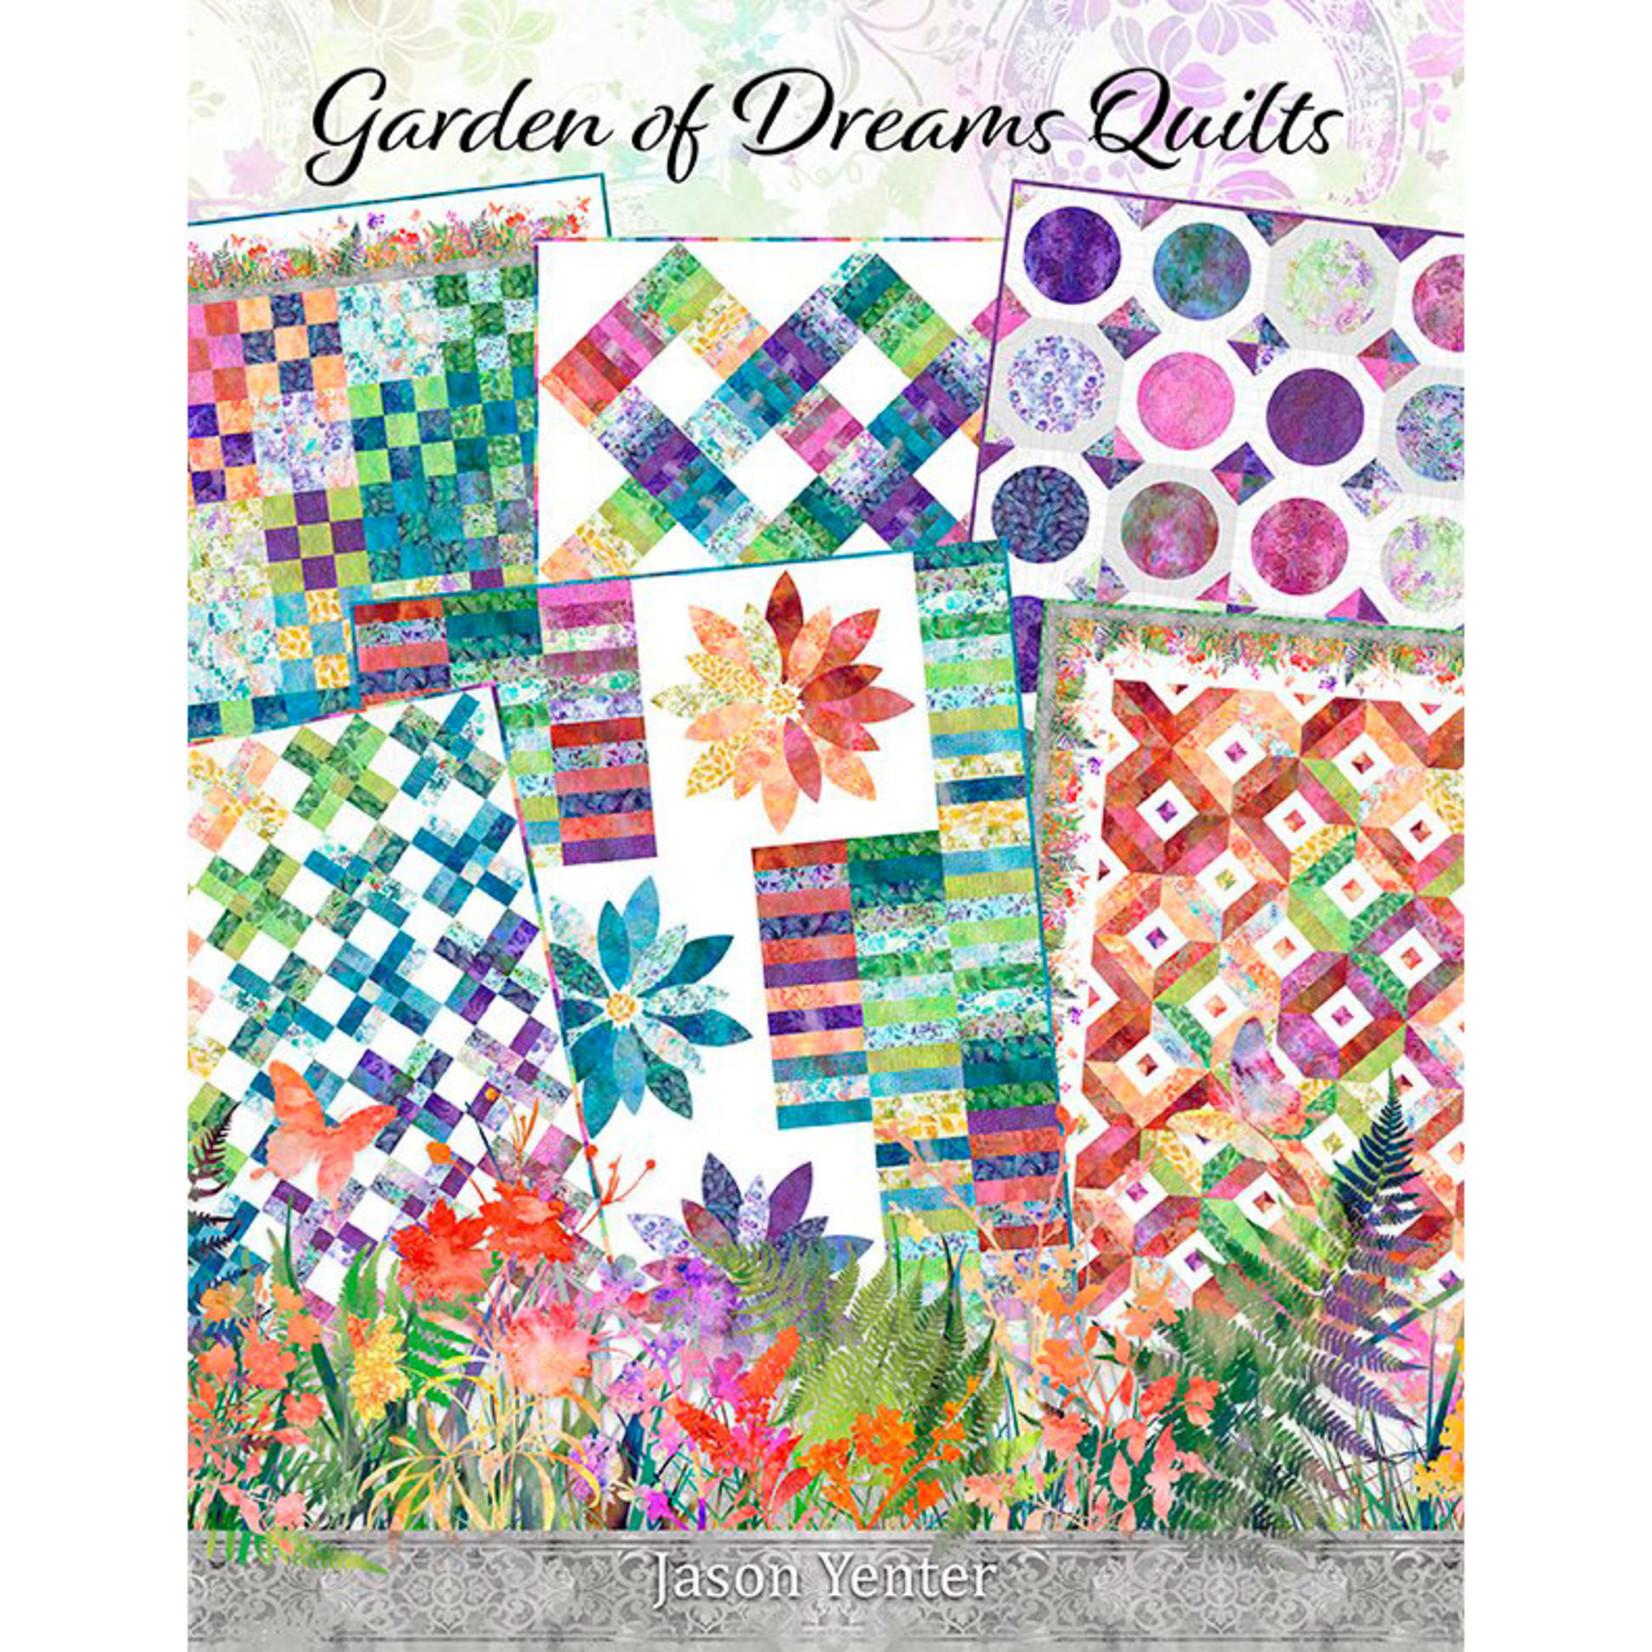 Garden of Dreams Quilts - Jason Yenter